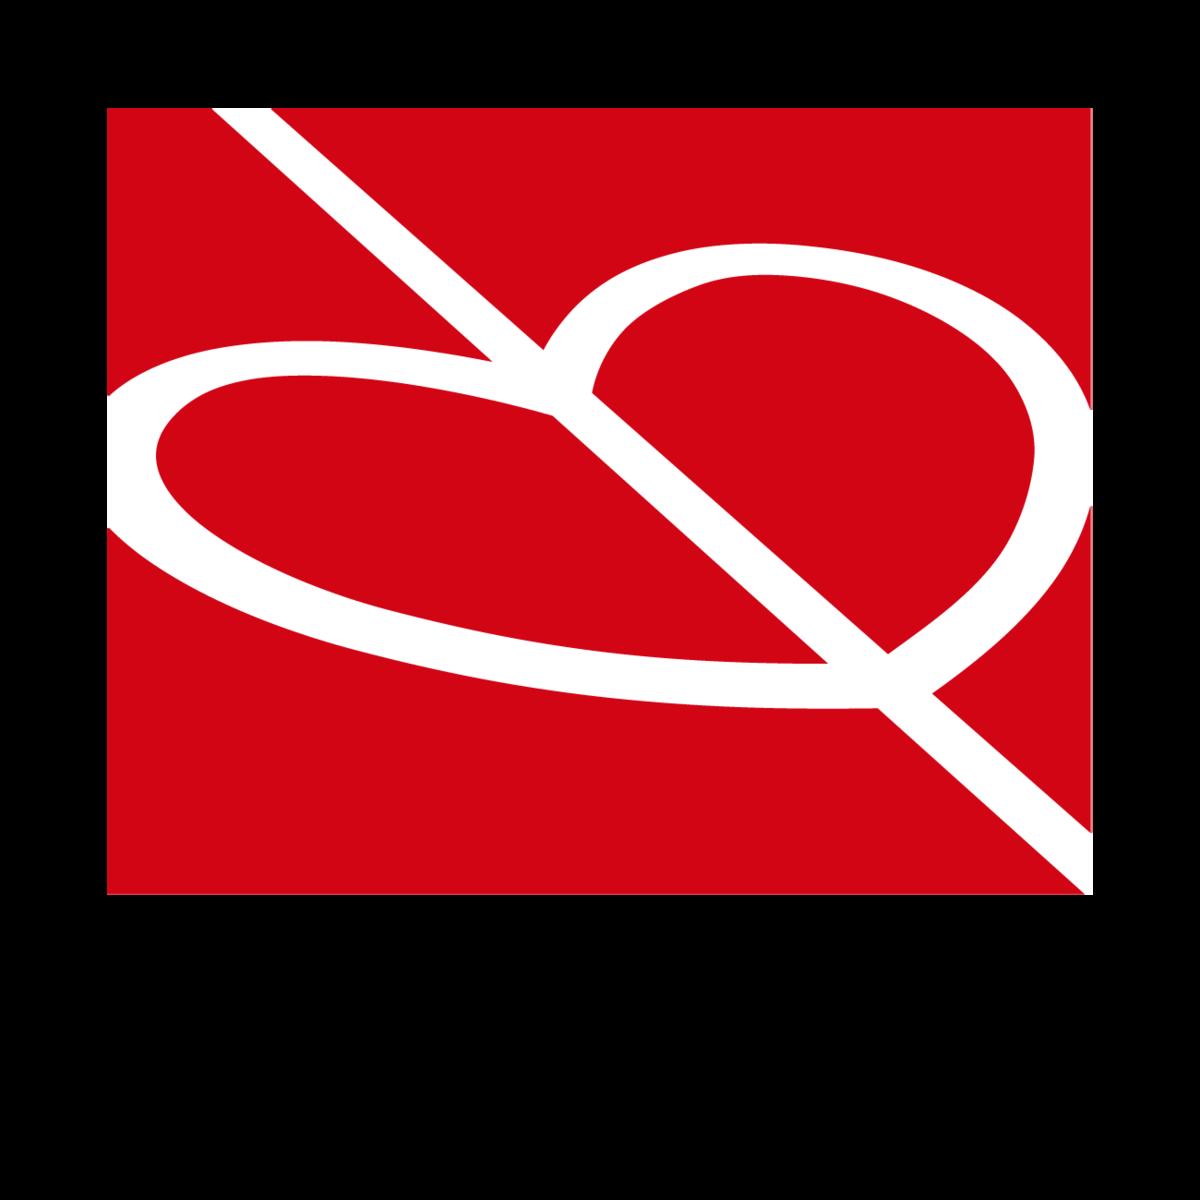 DFL Stiftung